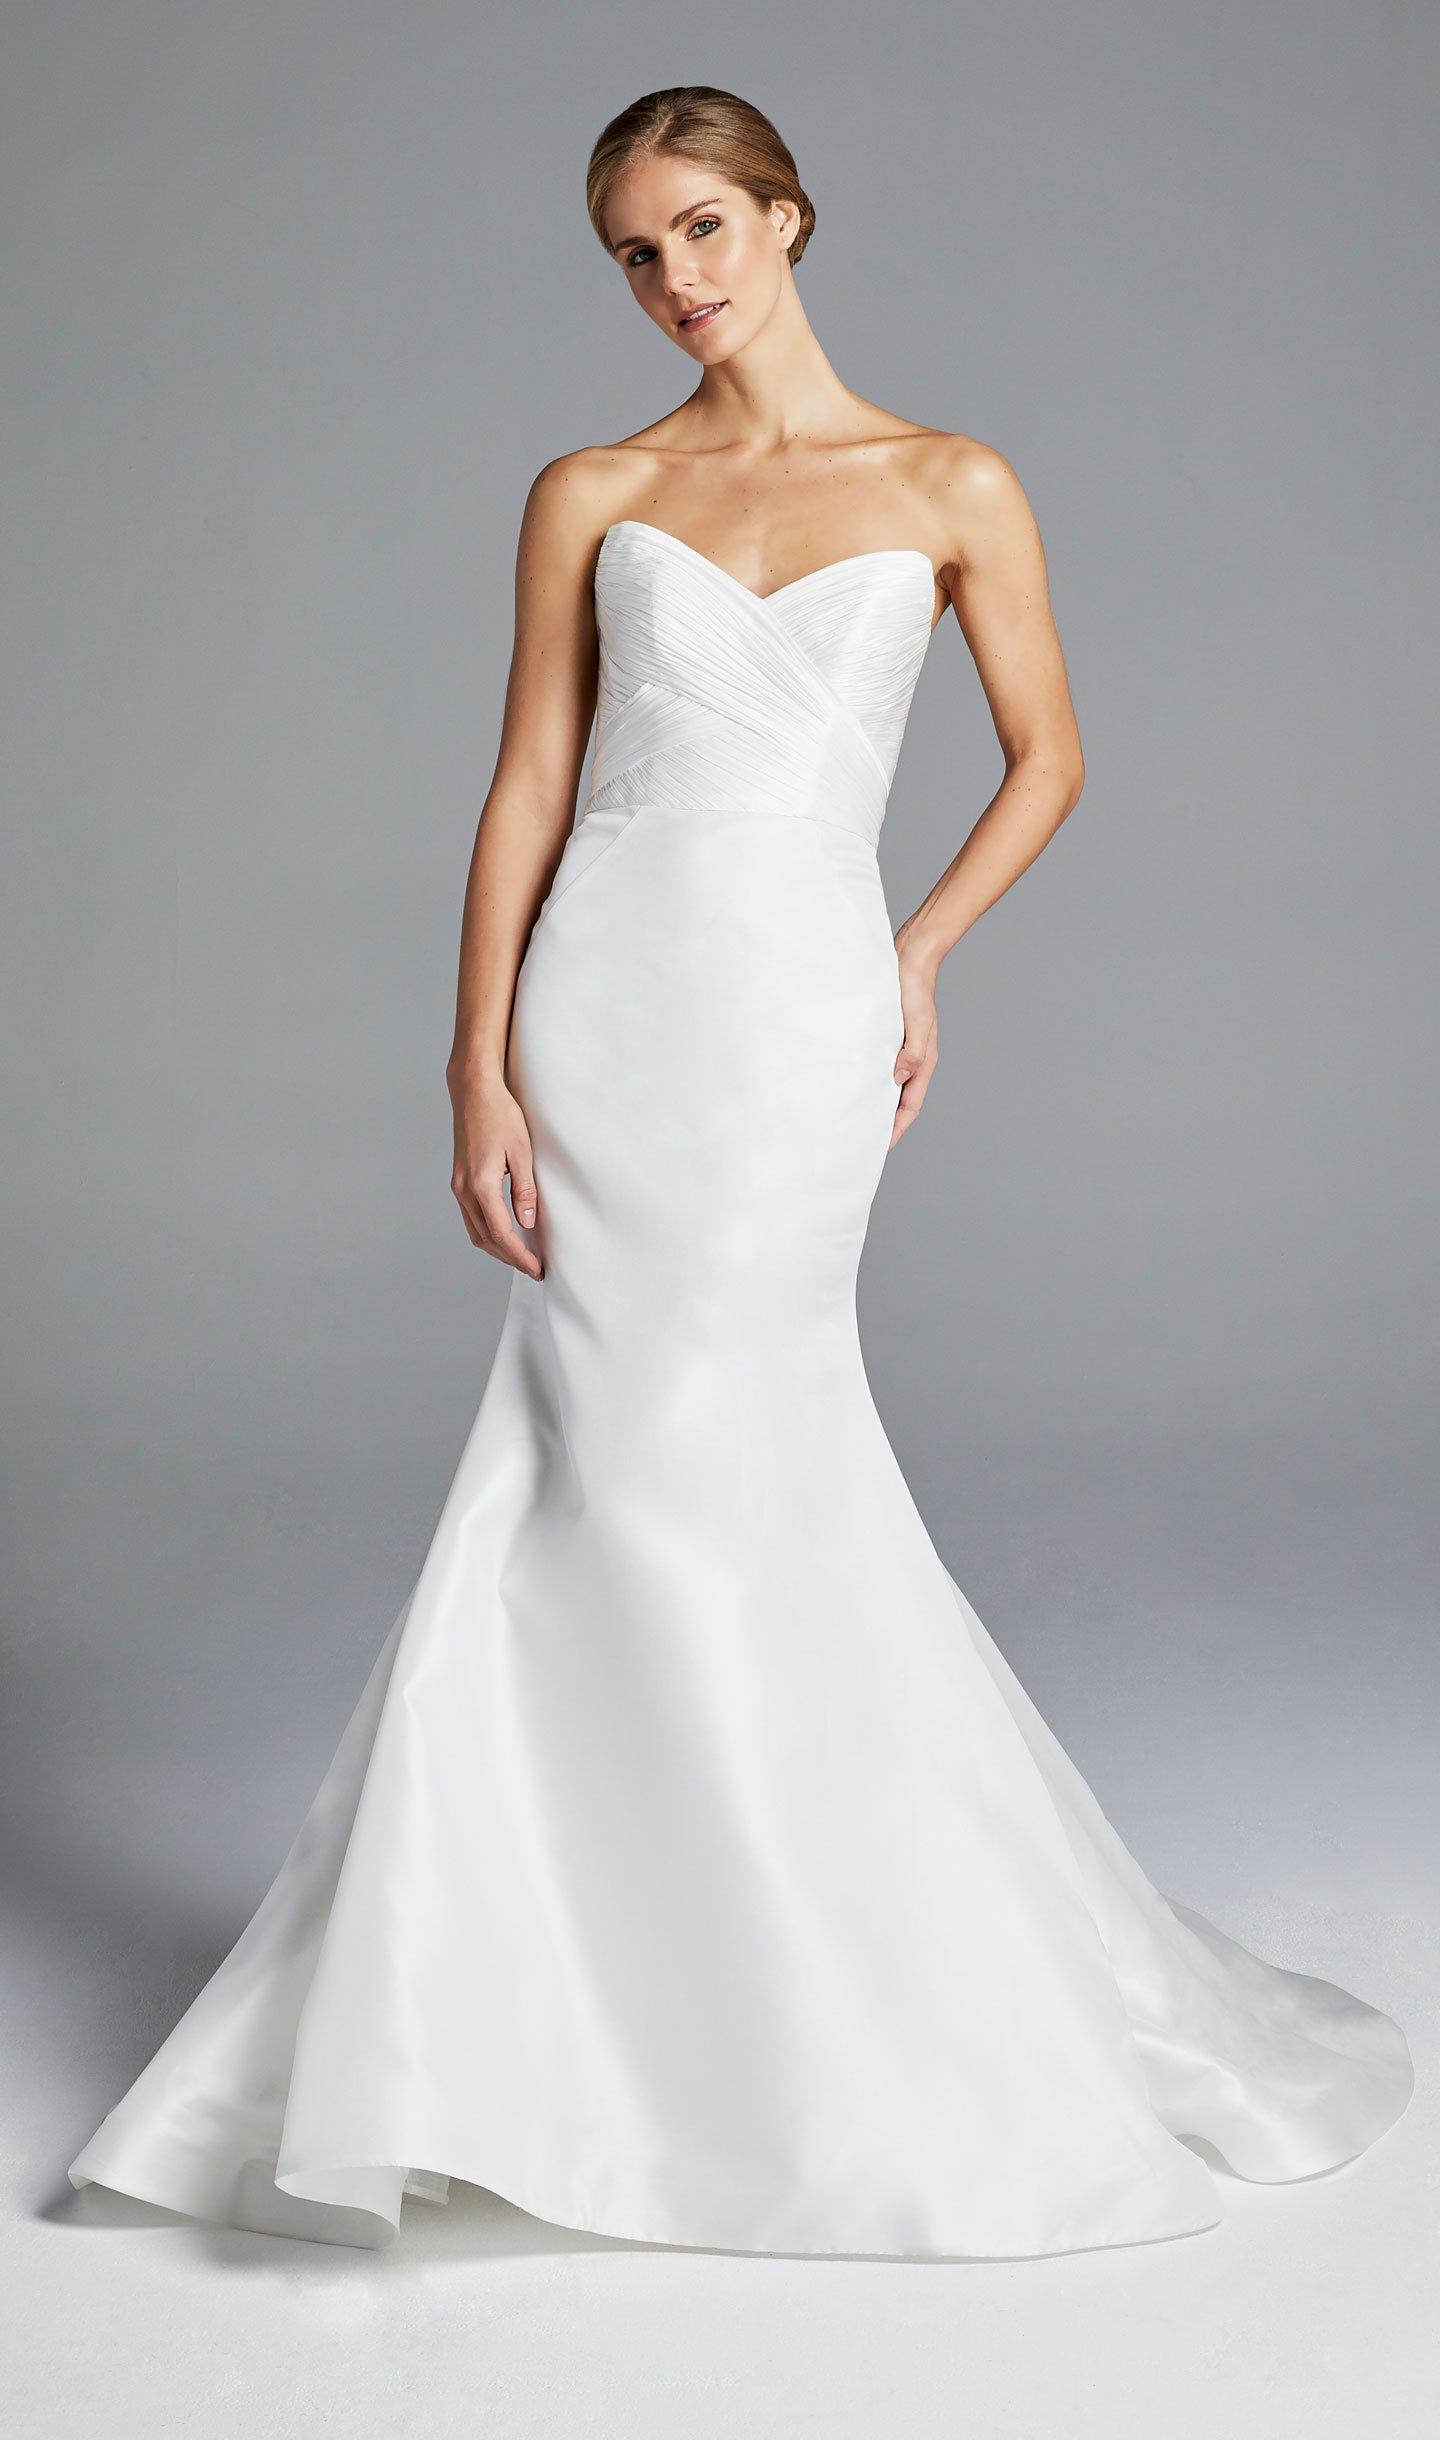 Sweetheart Neckline Ruched Bodice Wedding Dress